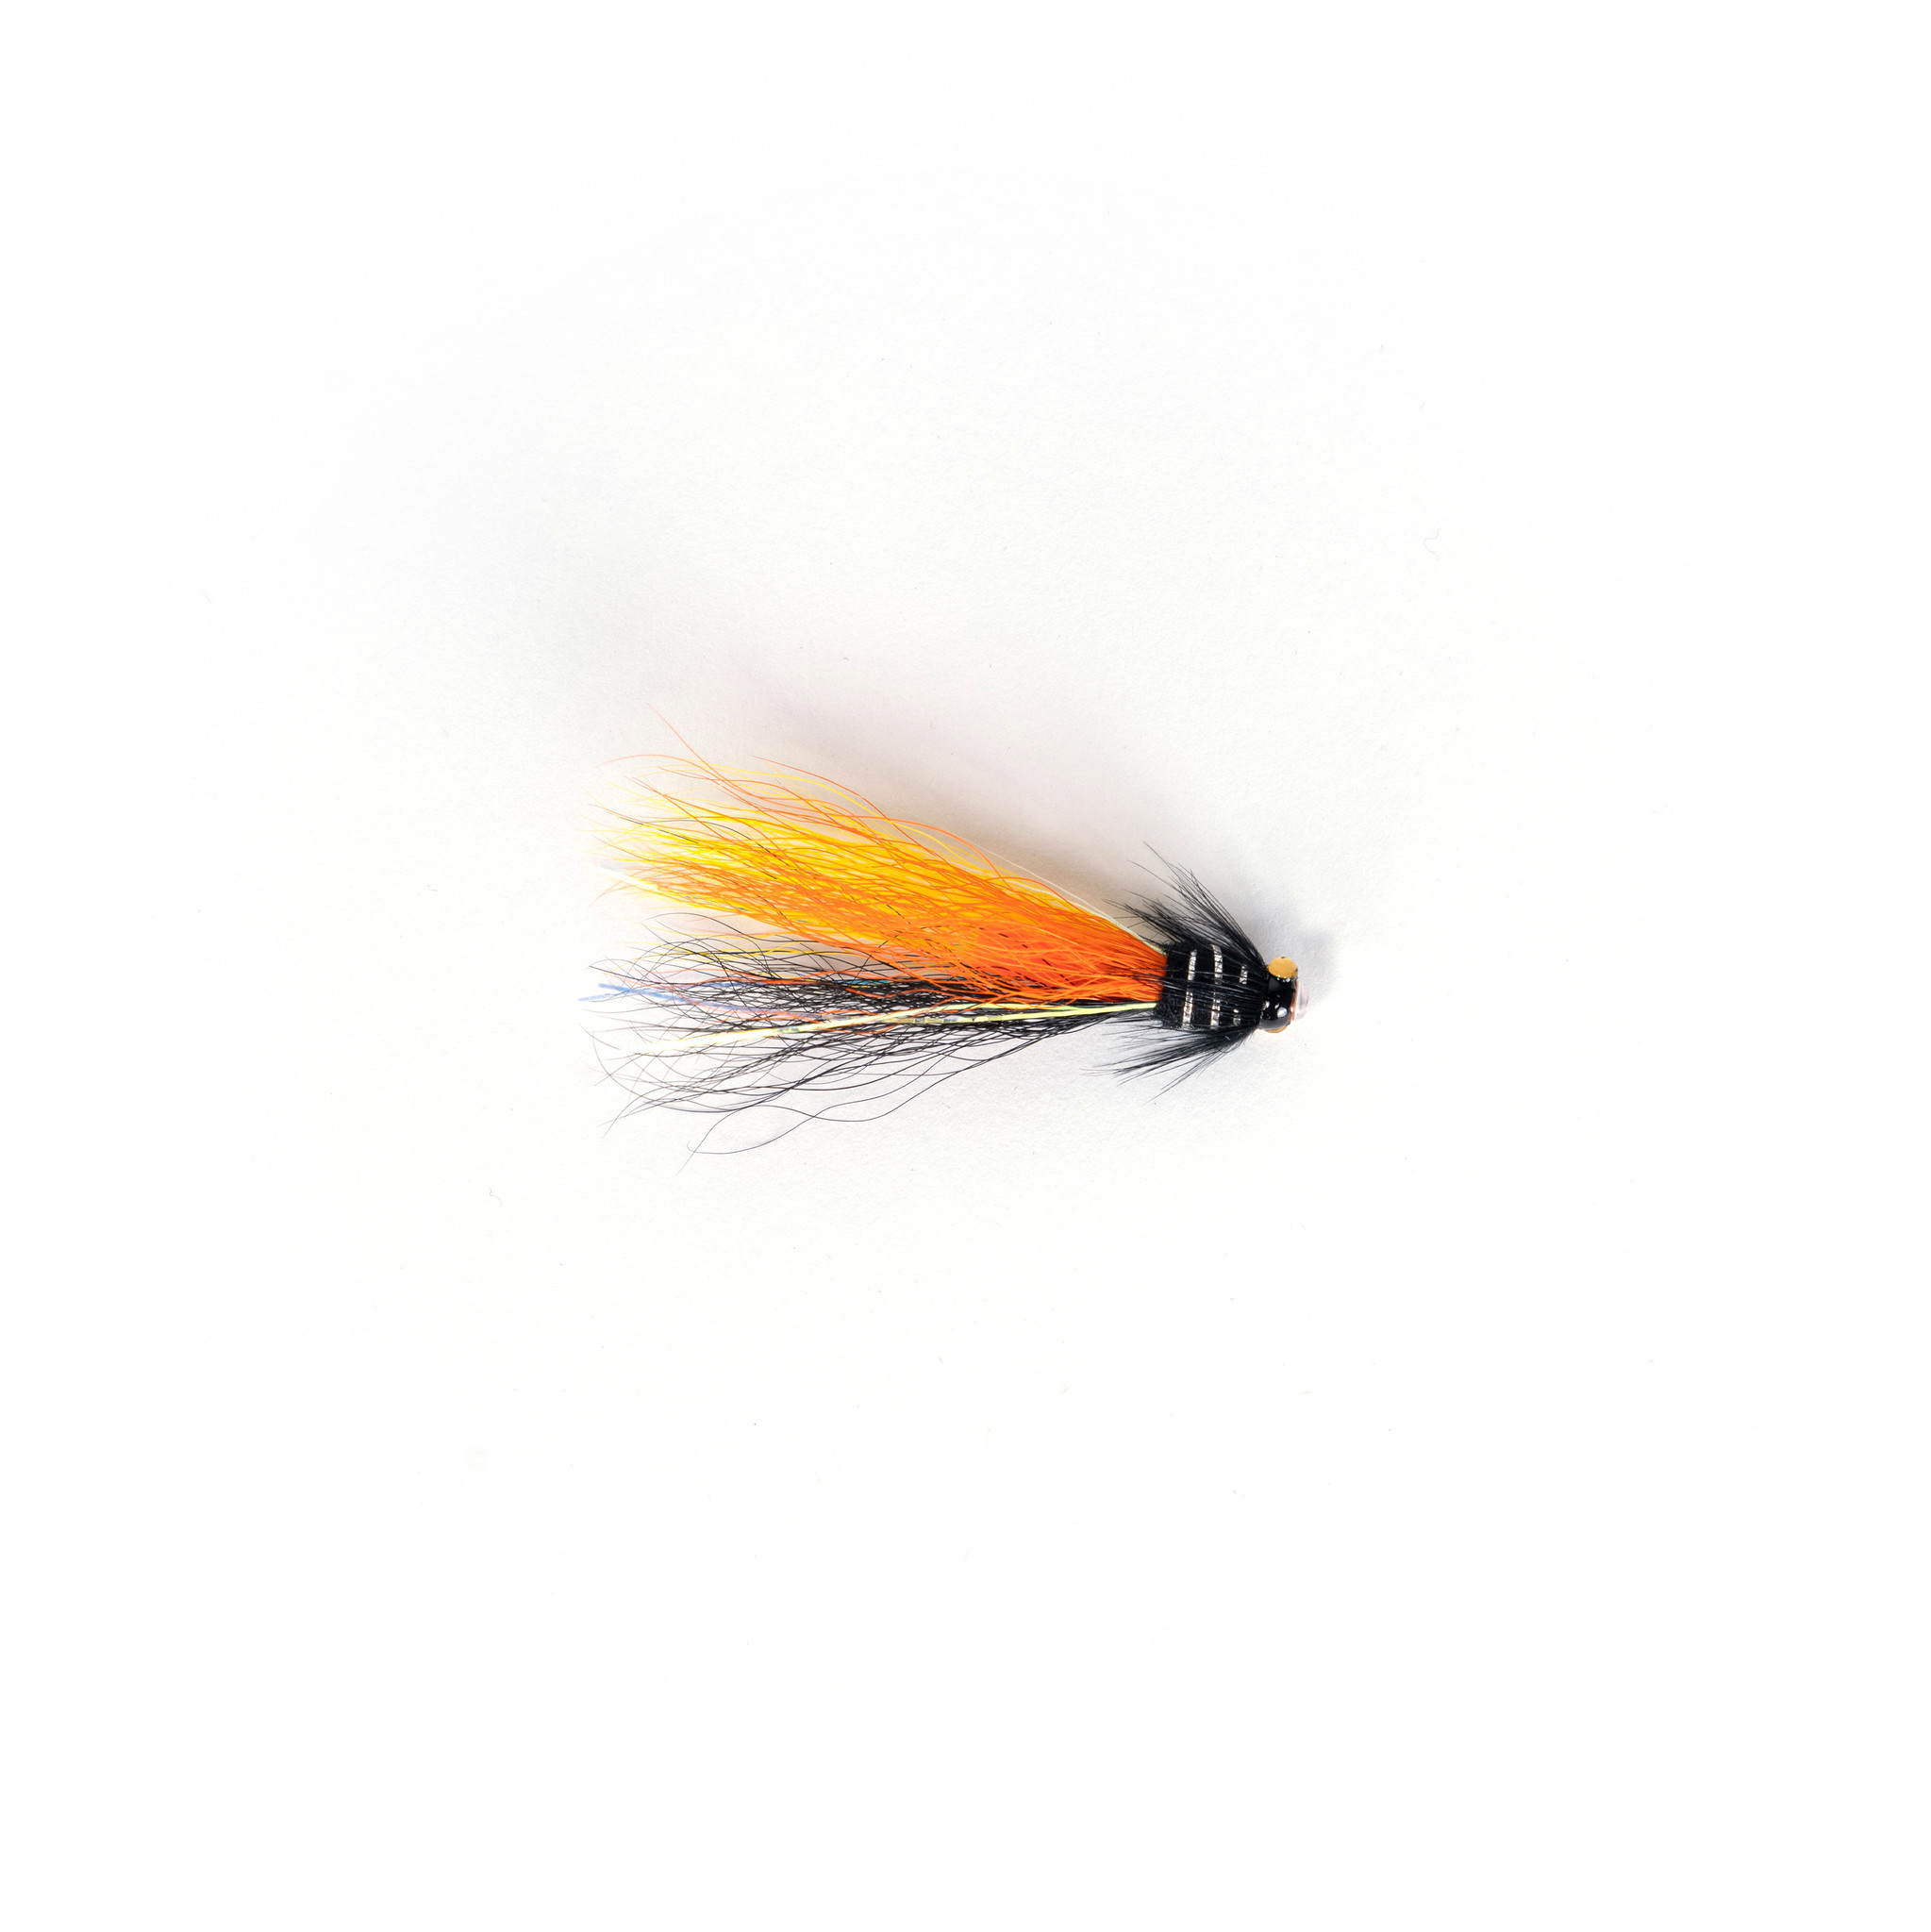 Snaelda-Krinkle Yellow/Orange/Black (1/2